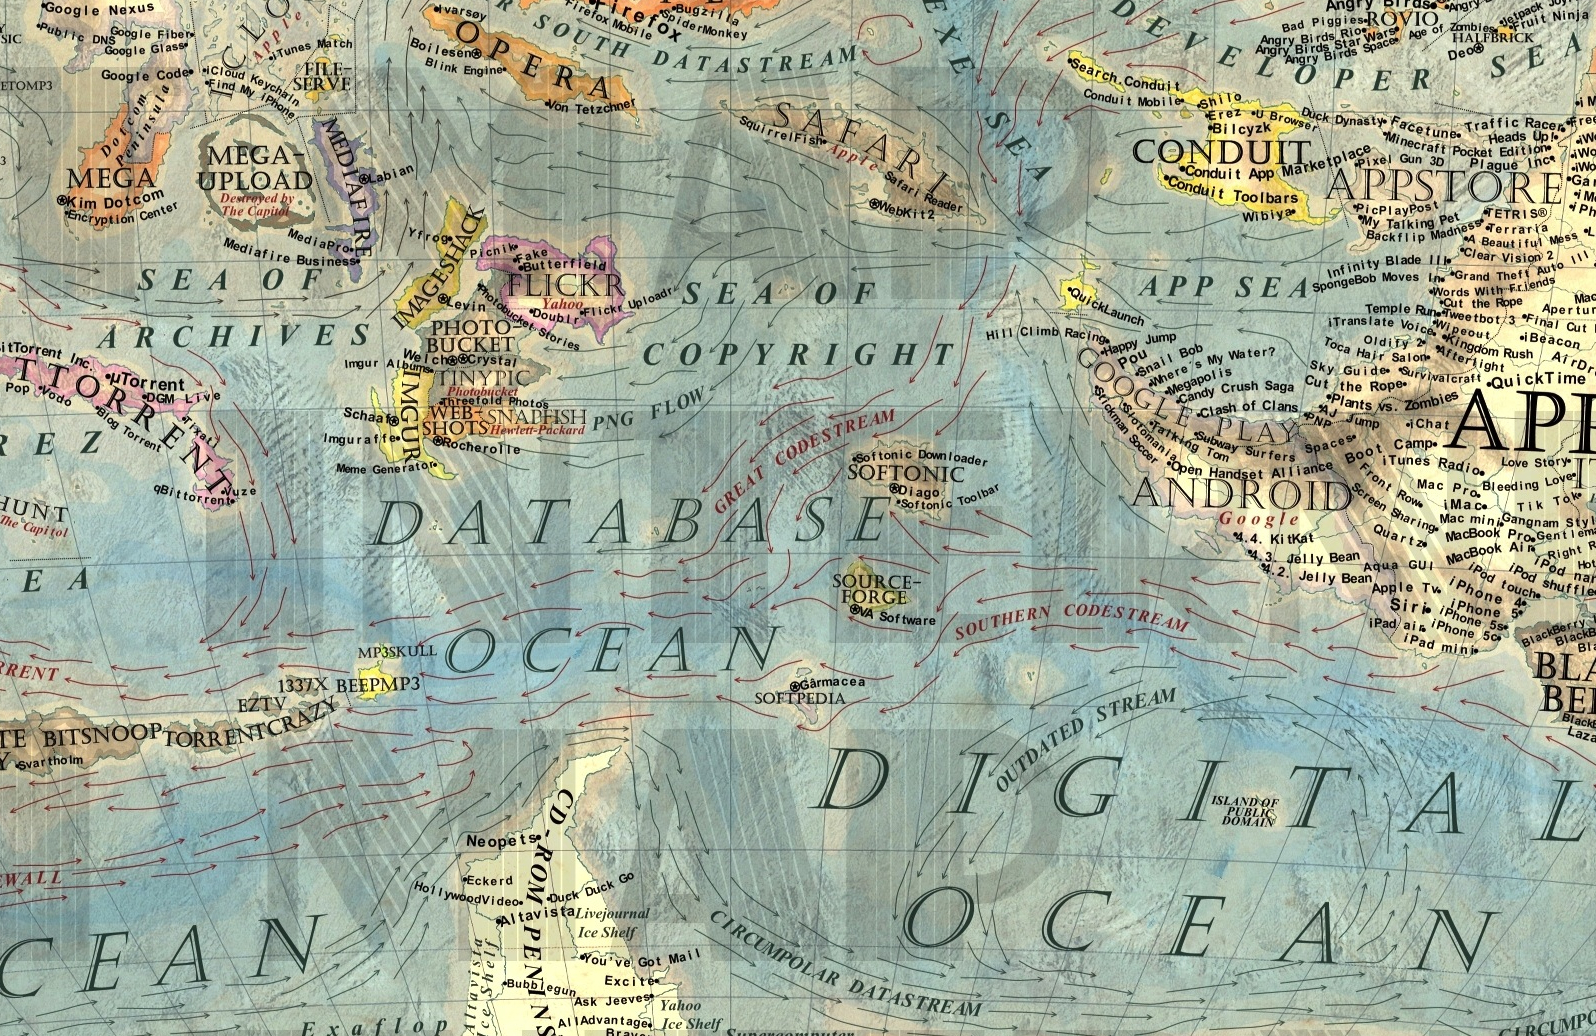 Sea of Copyright:Digital Ocean